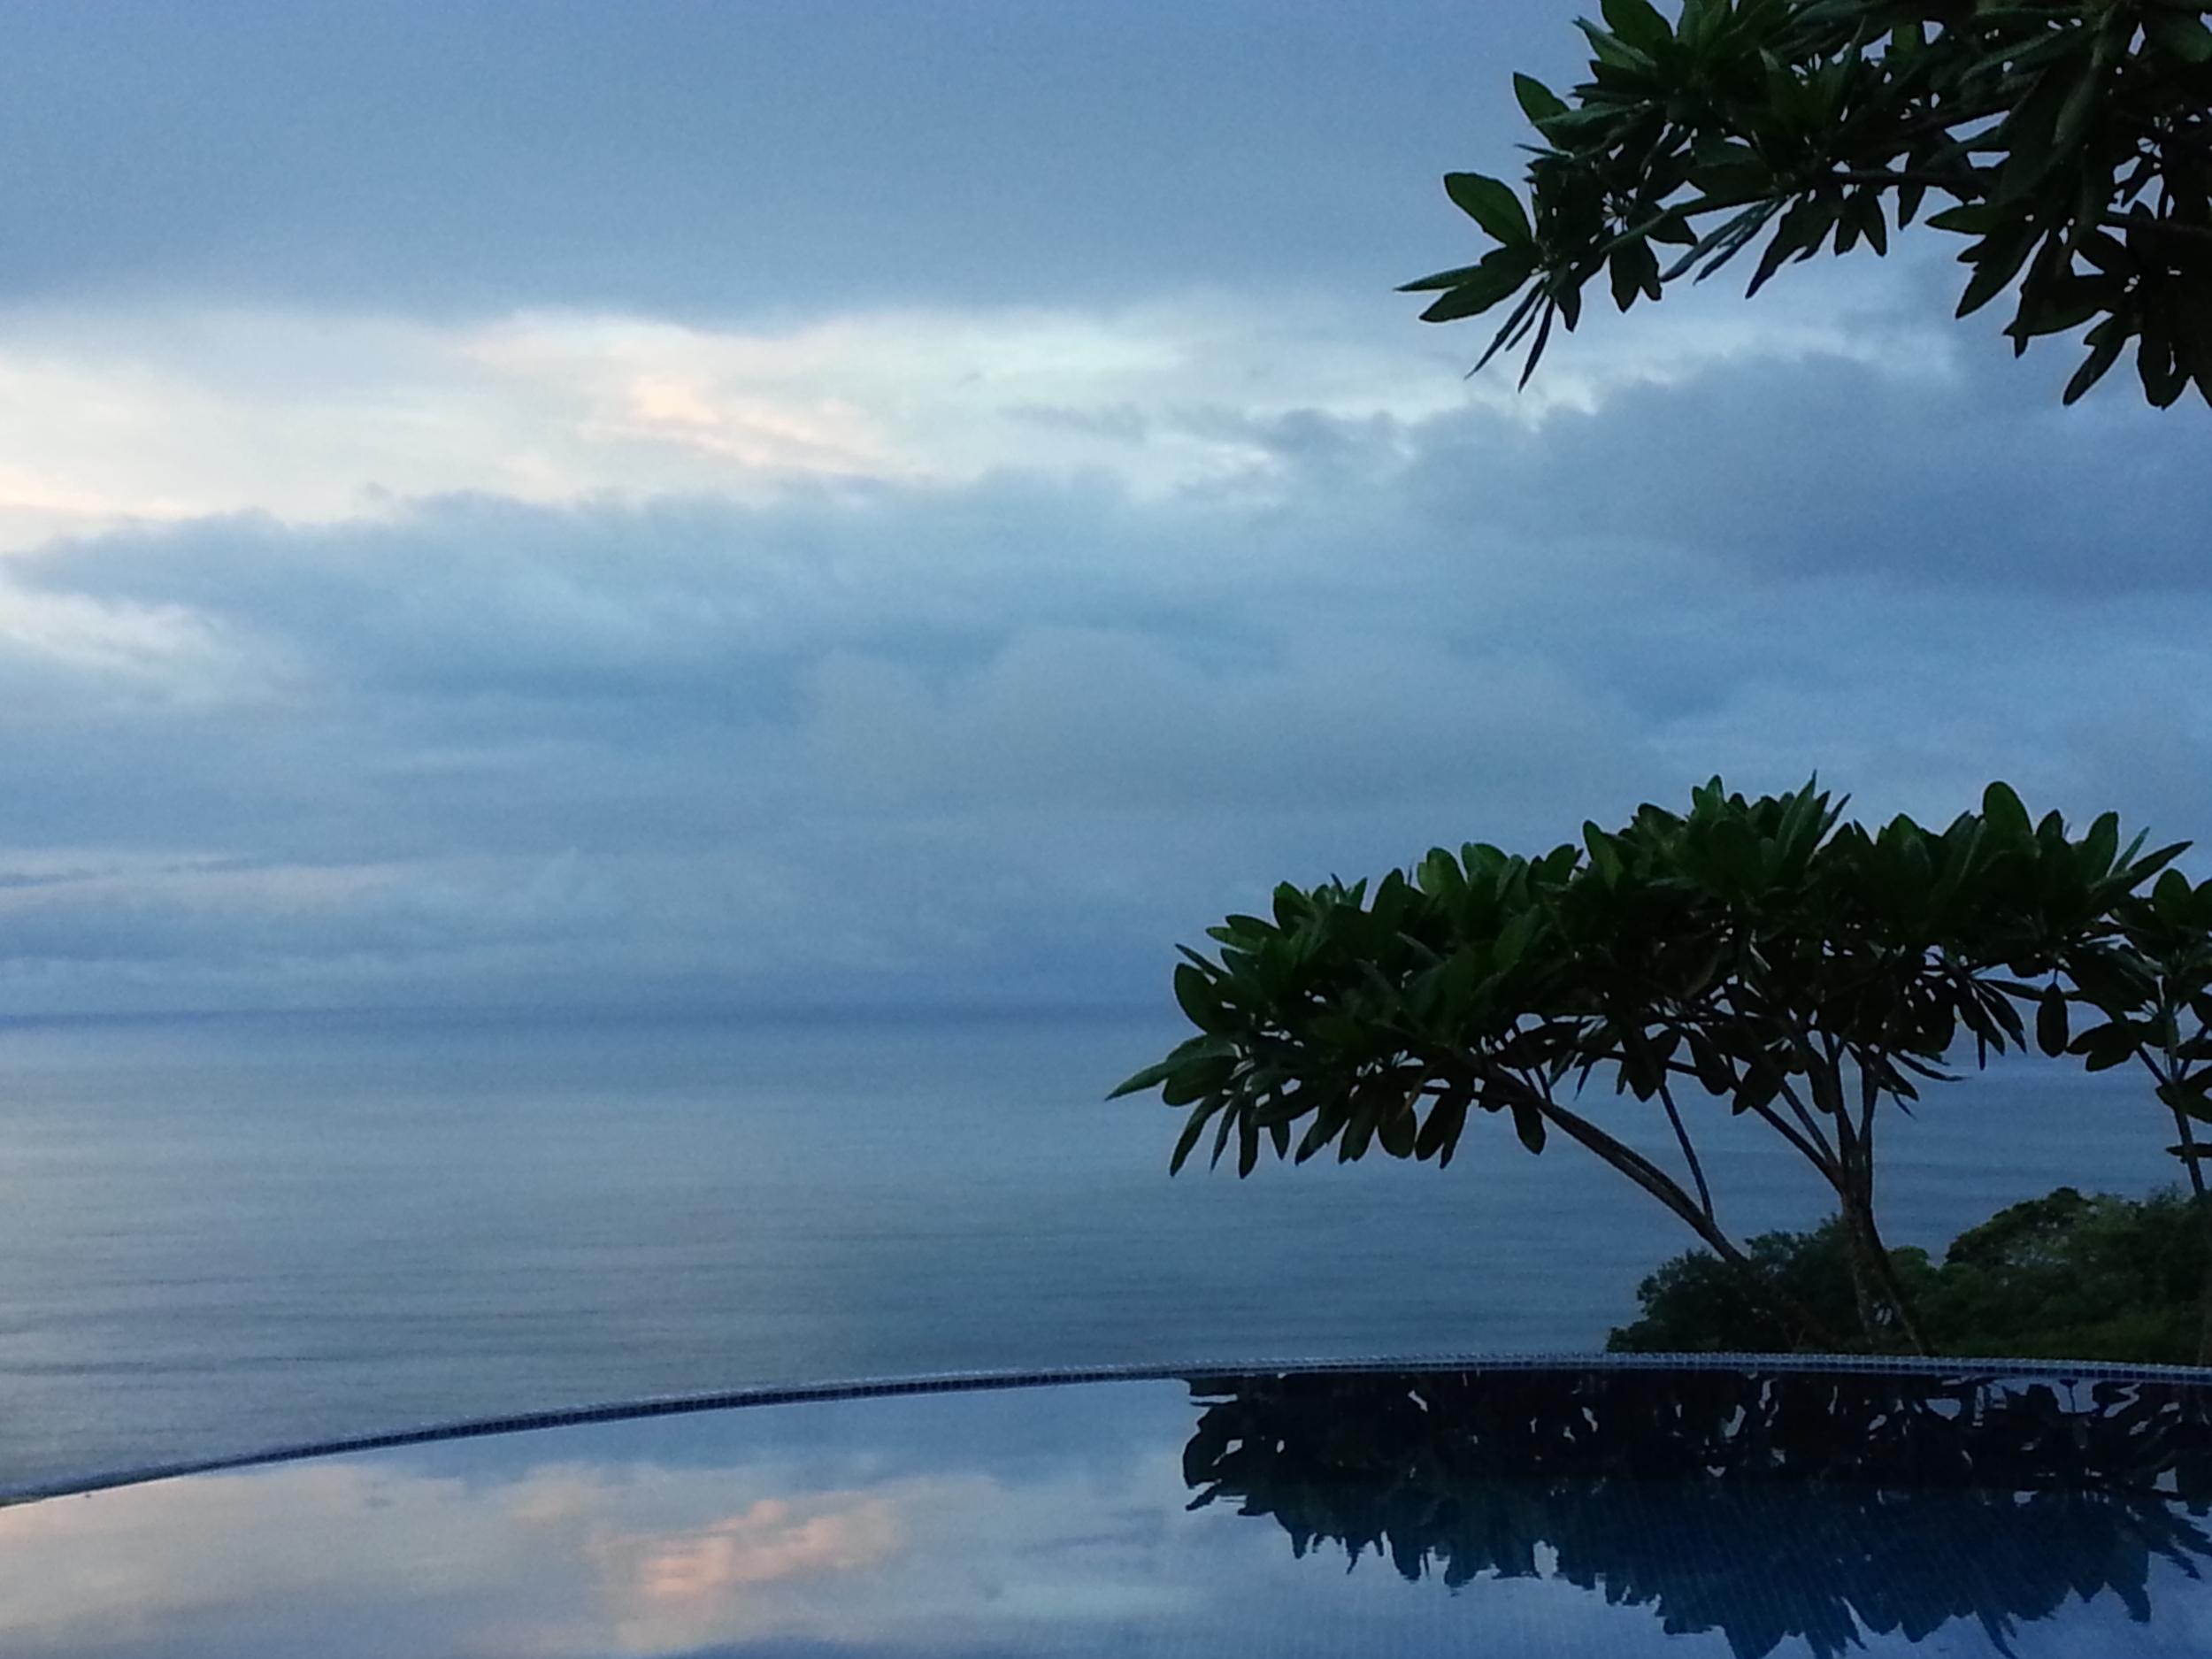 The infinity pool at Anamaya Resort